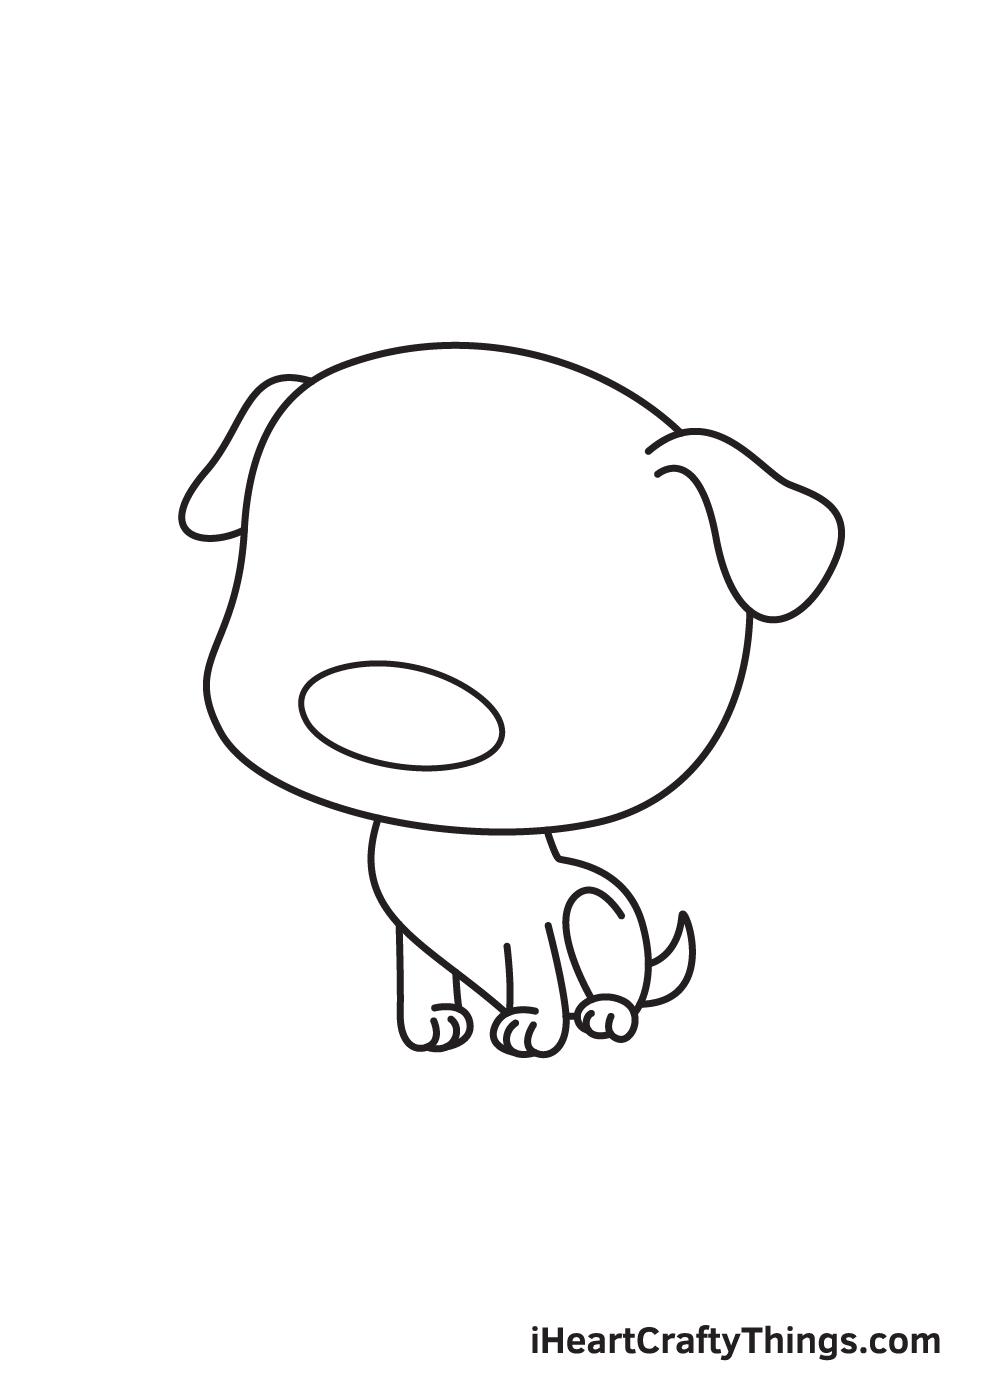 pug drawing step 6